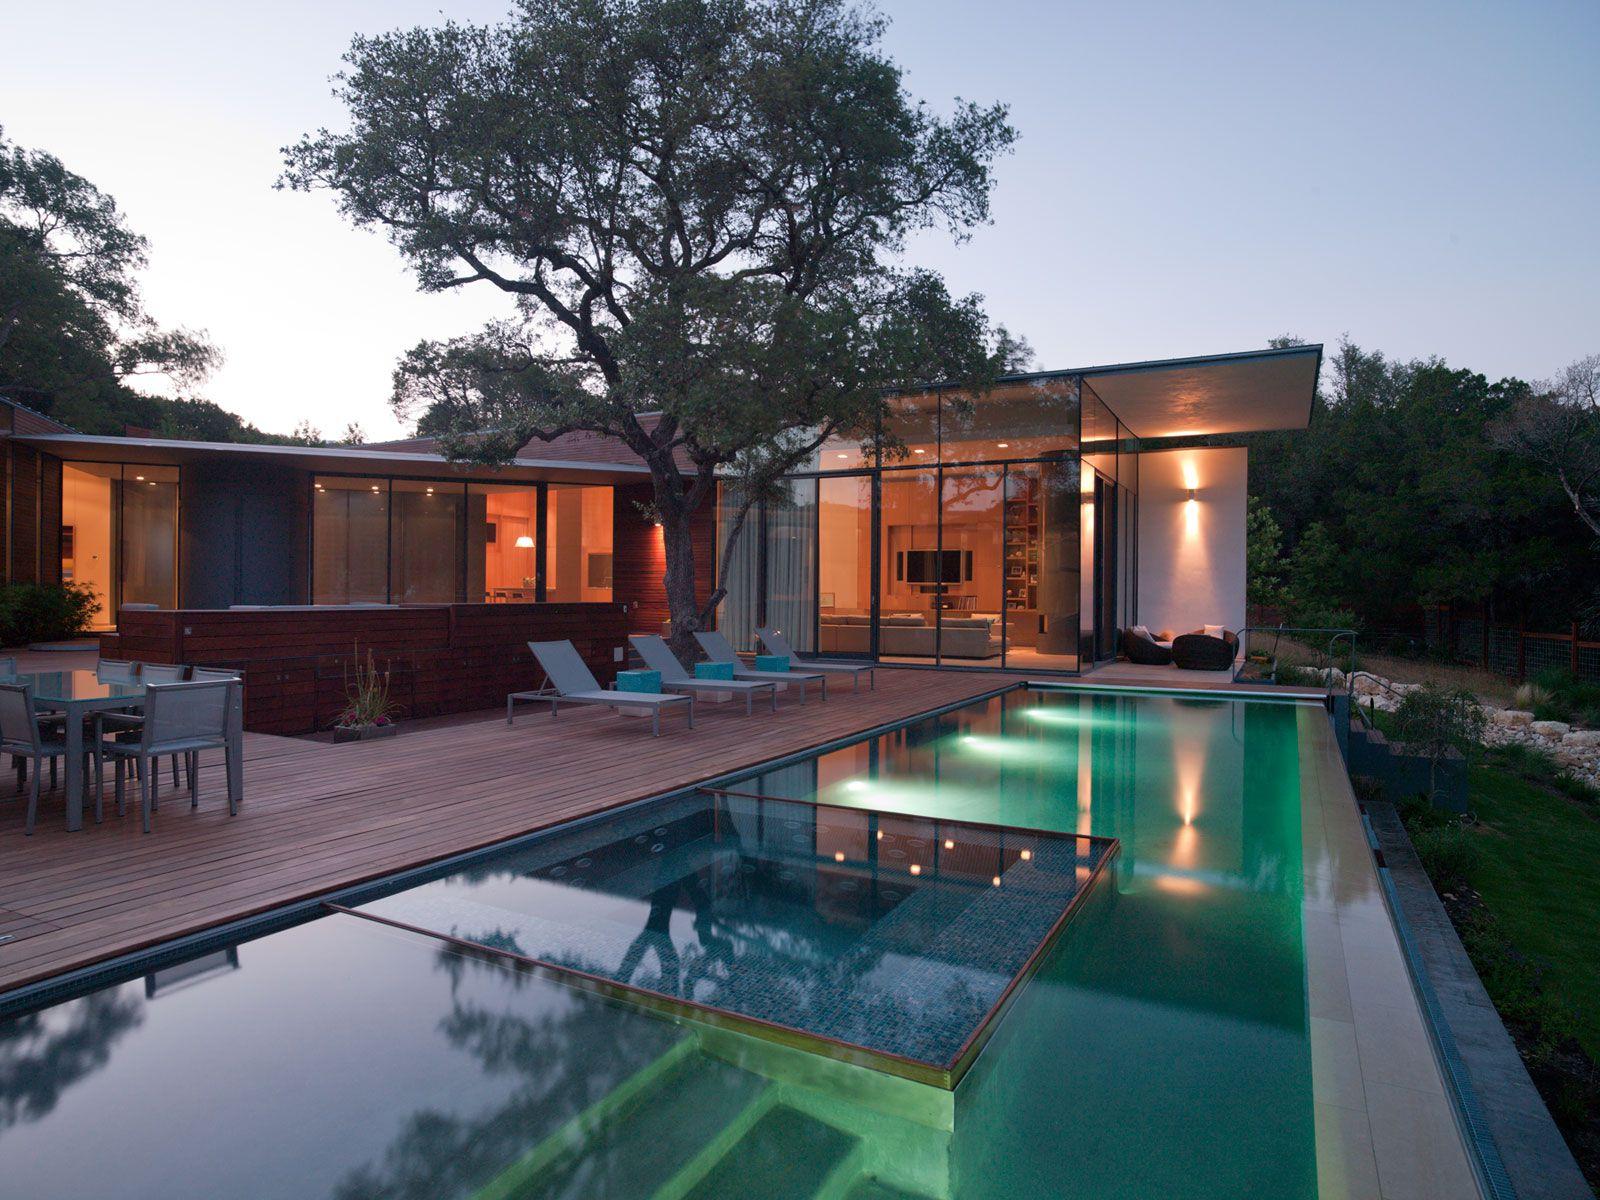 Cascading-Creek-House-13